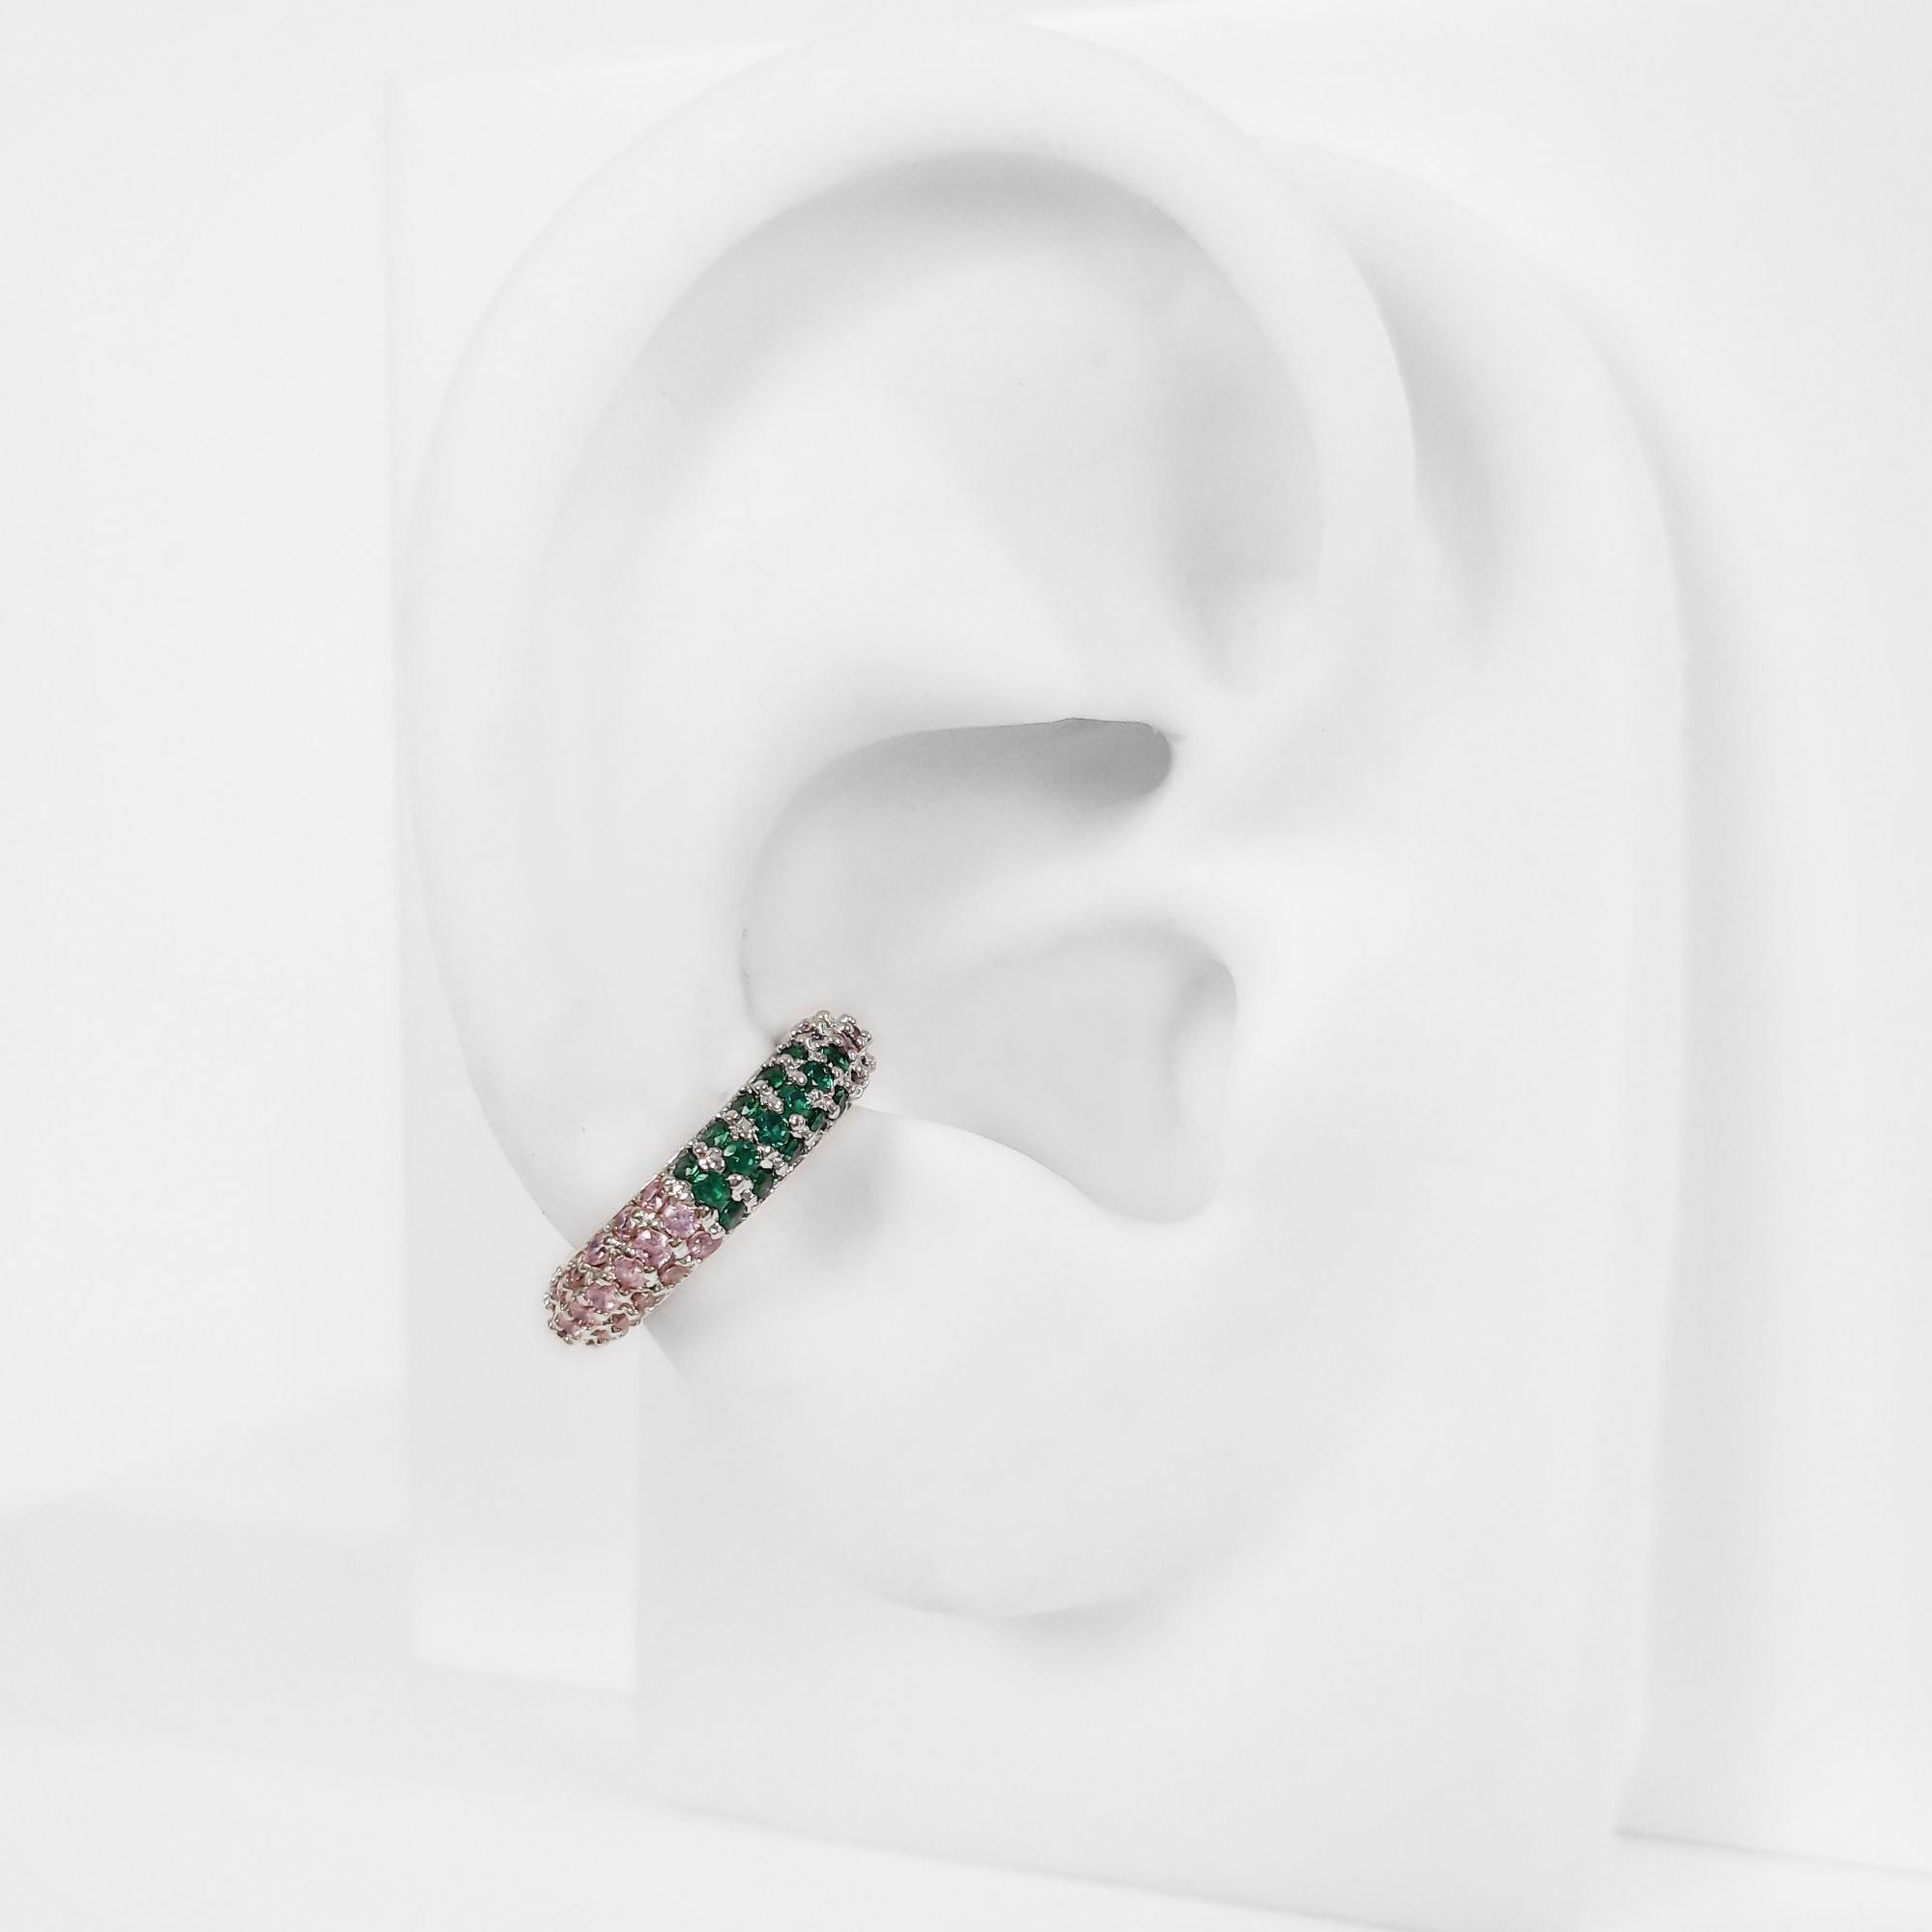 Piercing Fake Ear Hook Argola Cravejado Folheado Prata 1000  - Lunozê Joias